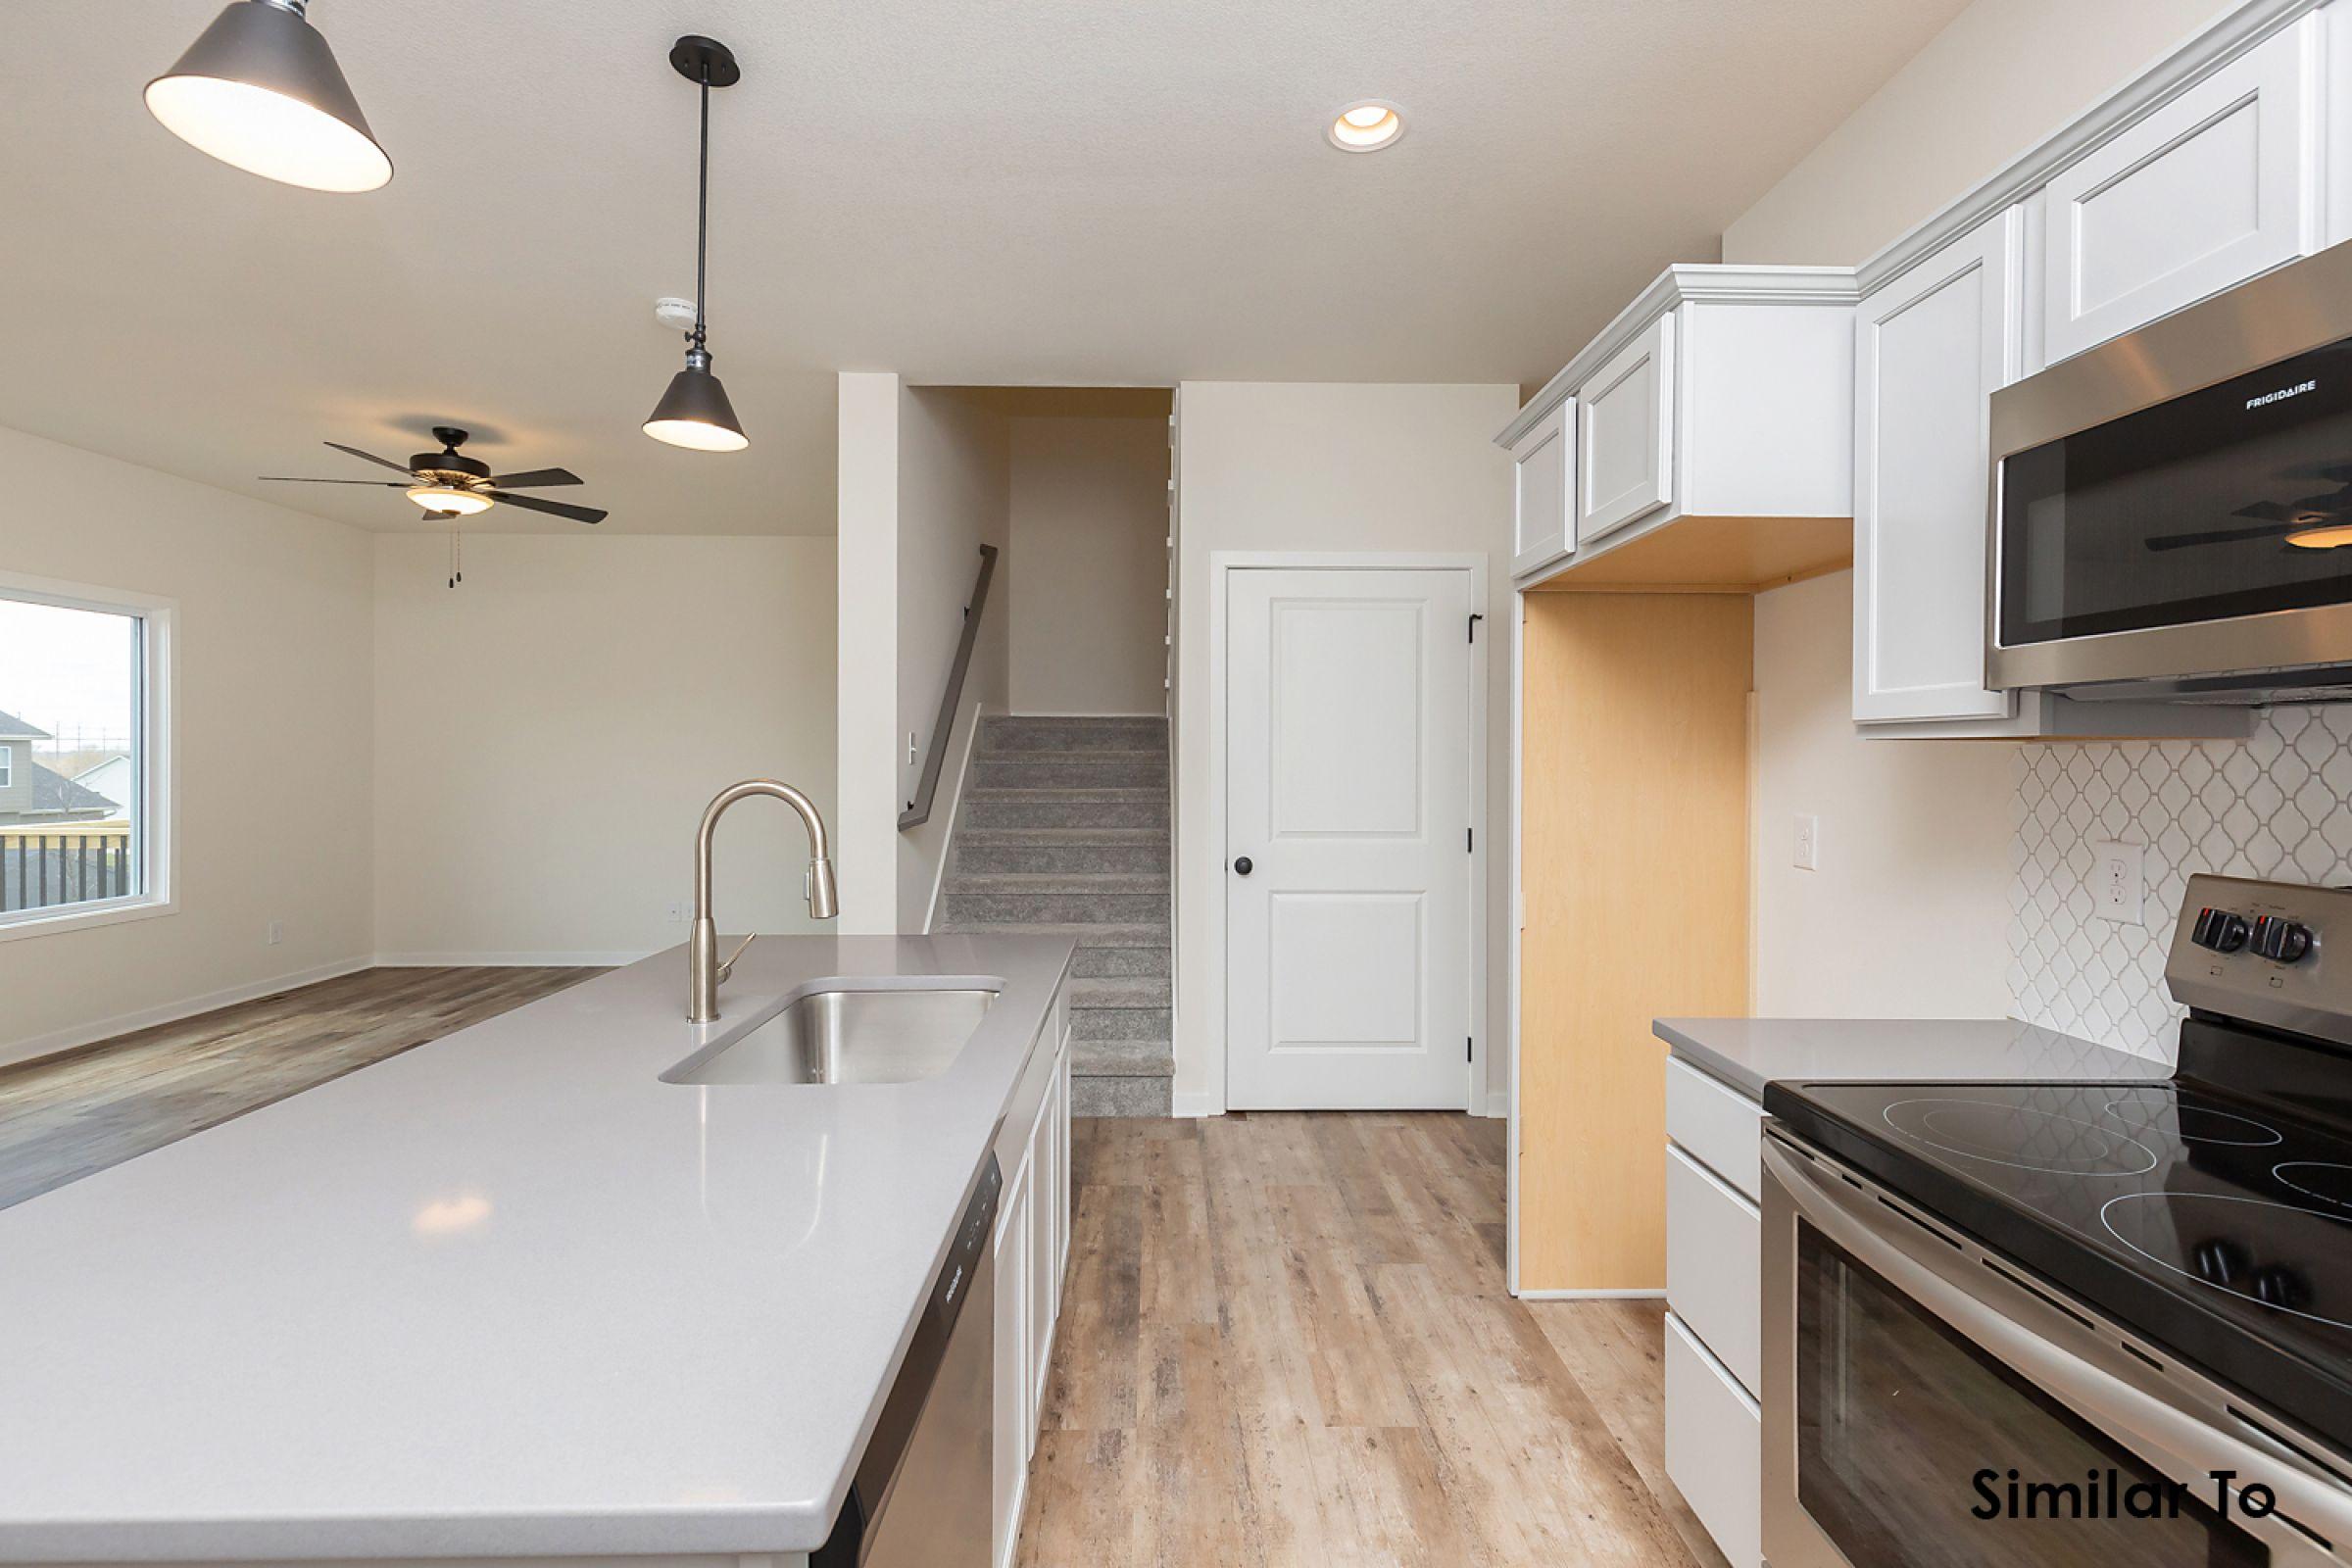 residential-warren-county-iowa-0-acres-listing-number-15134-5-2020-08-27-185022.jpg